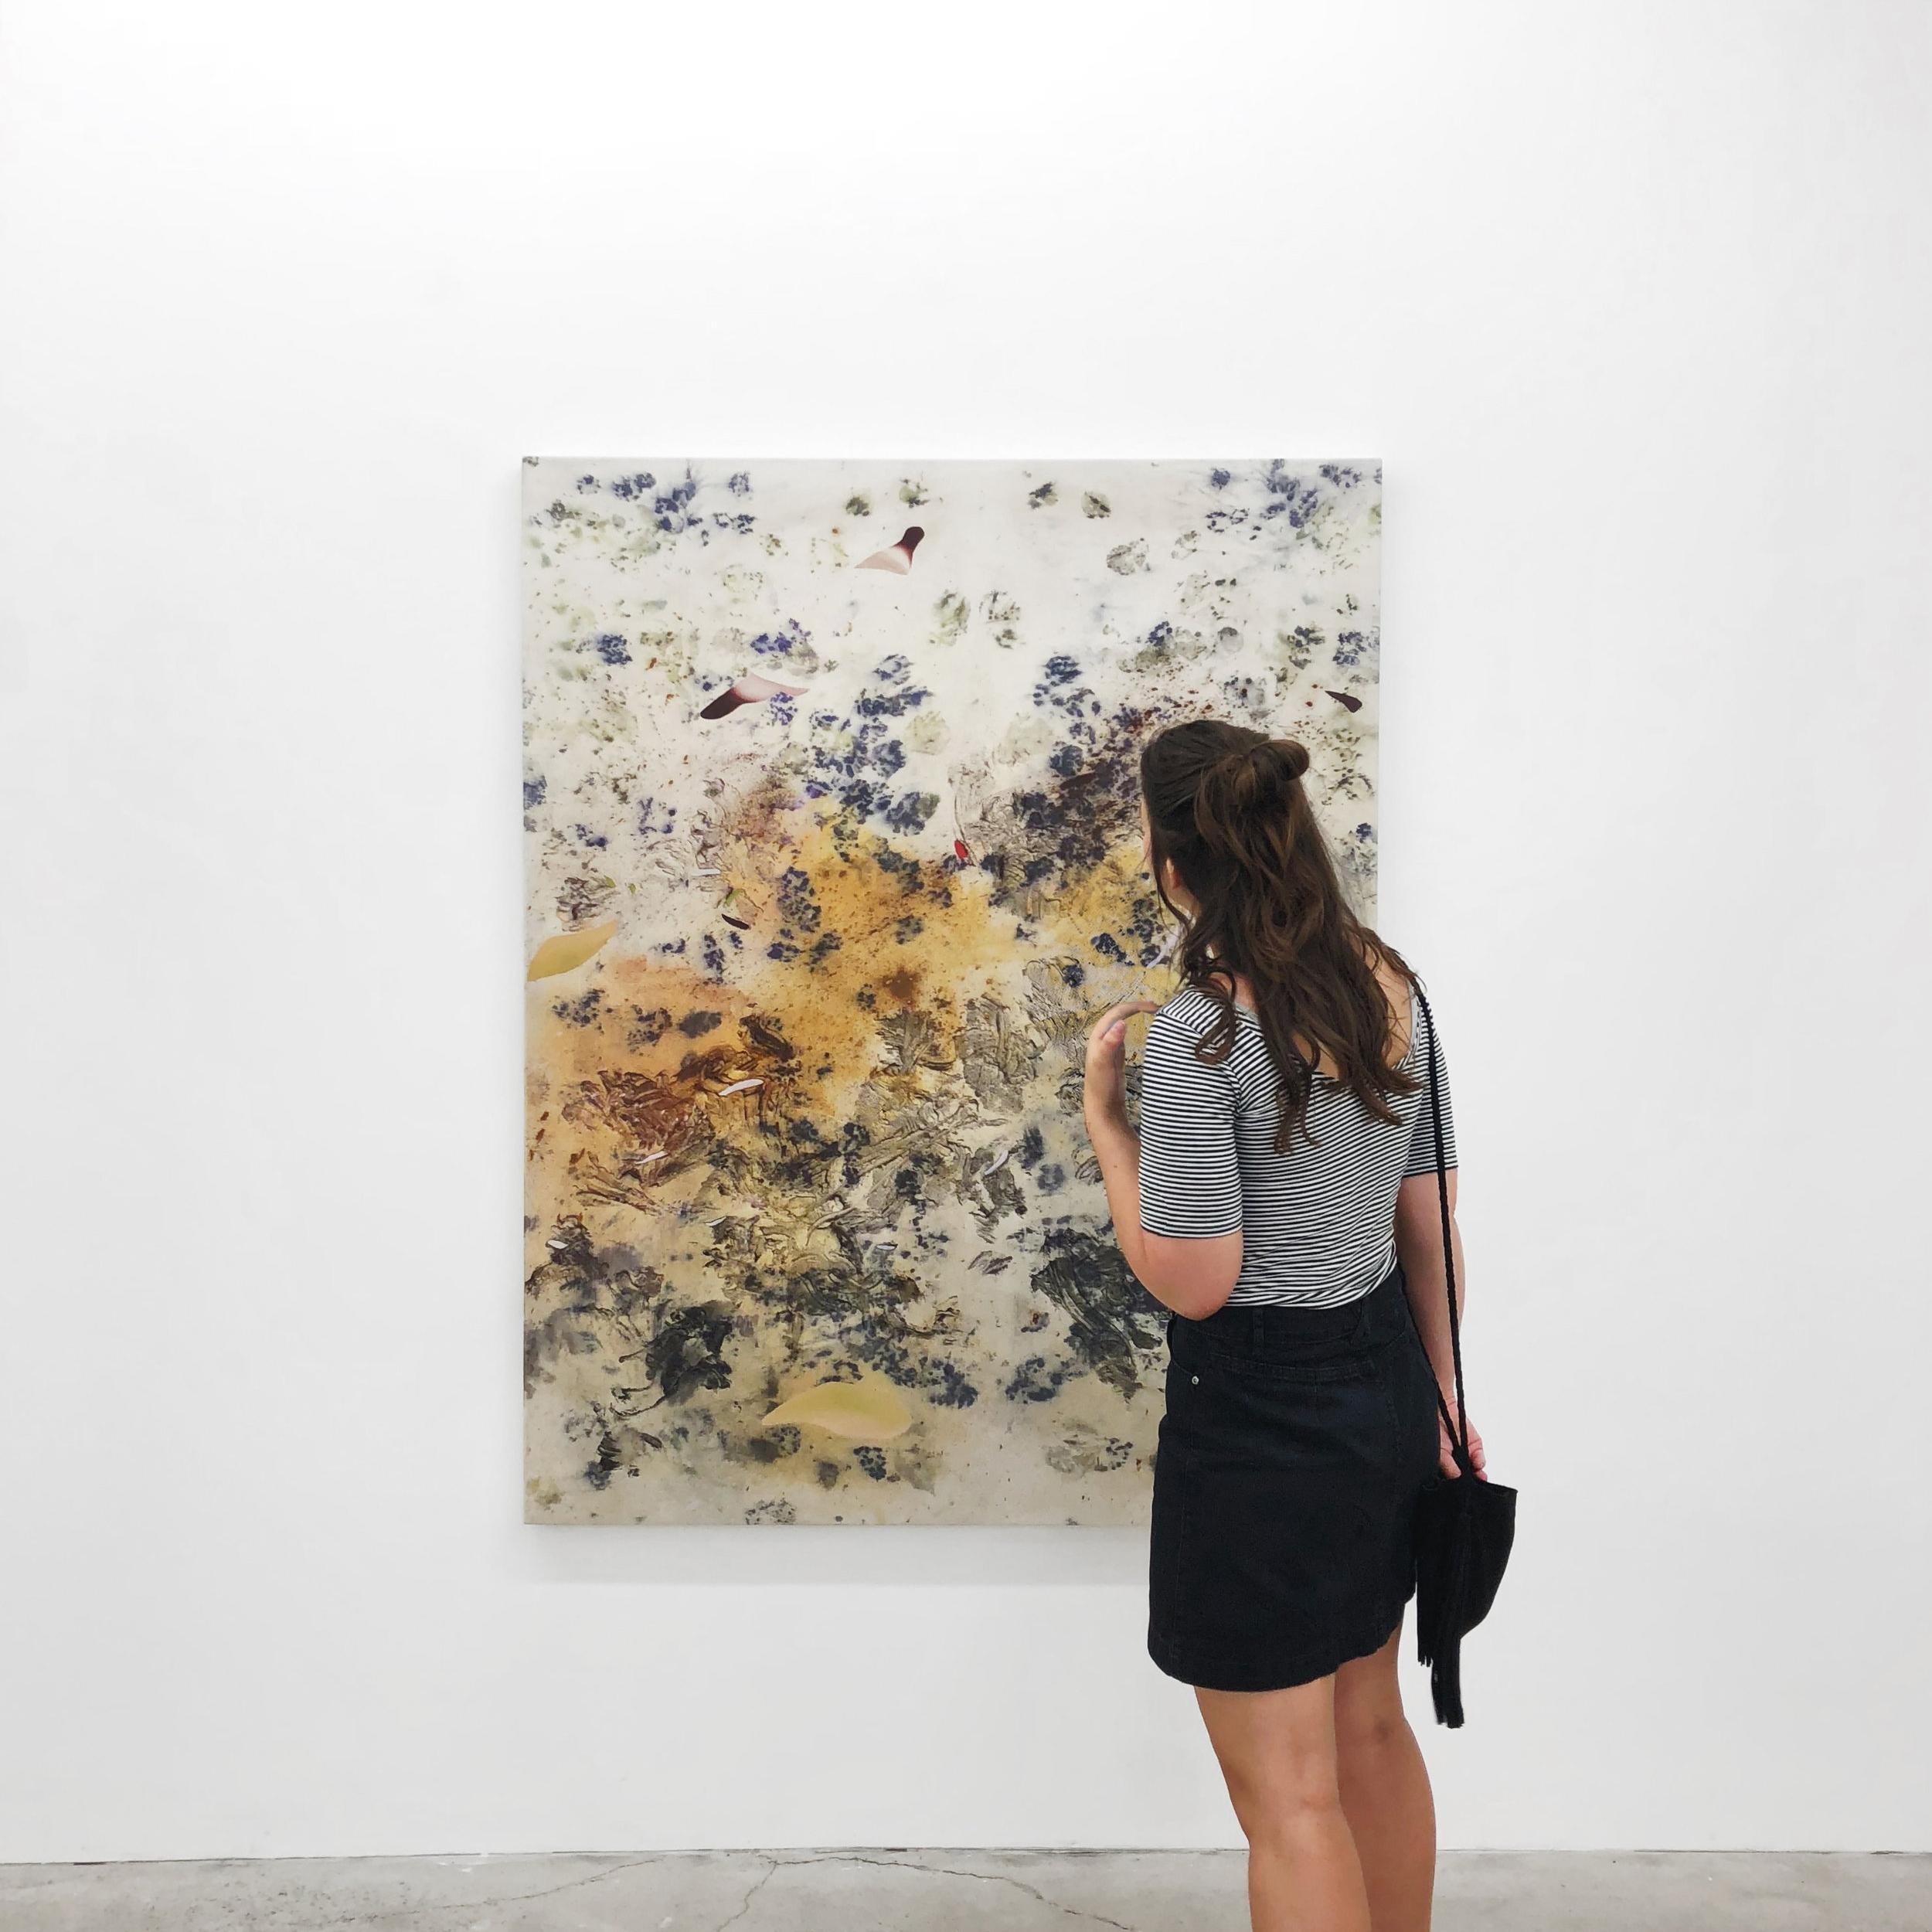 Gillian King_Coetus Floreus Installation_2018_1:2.jpg